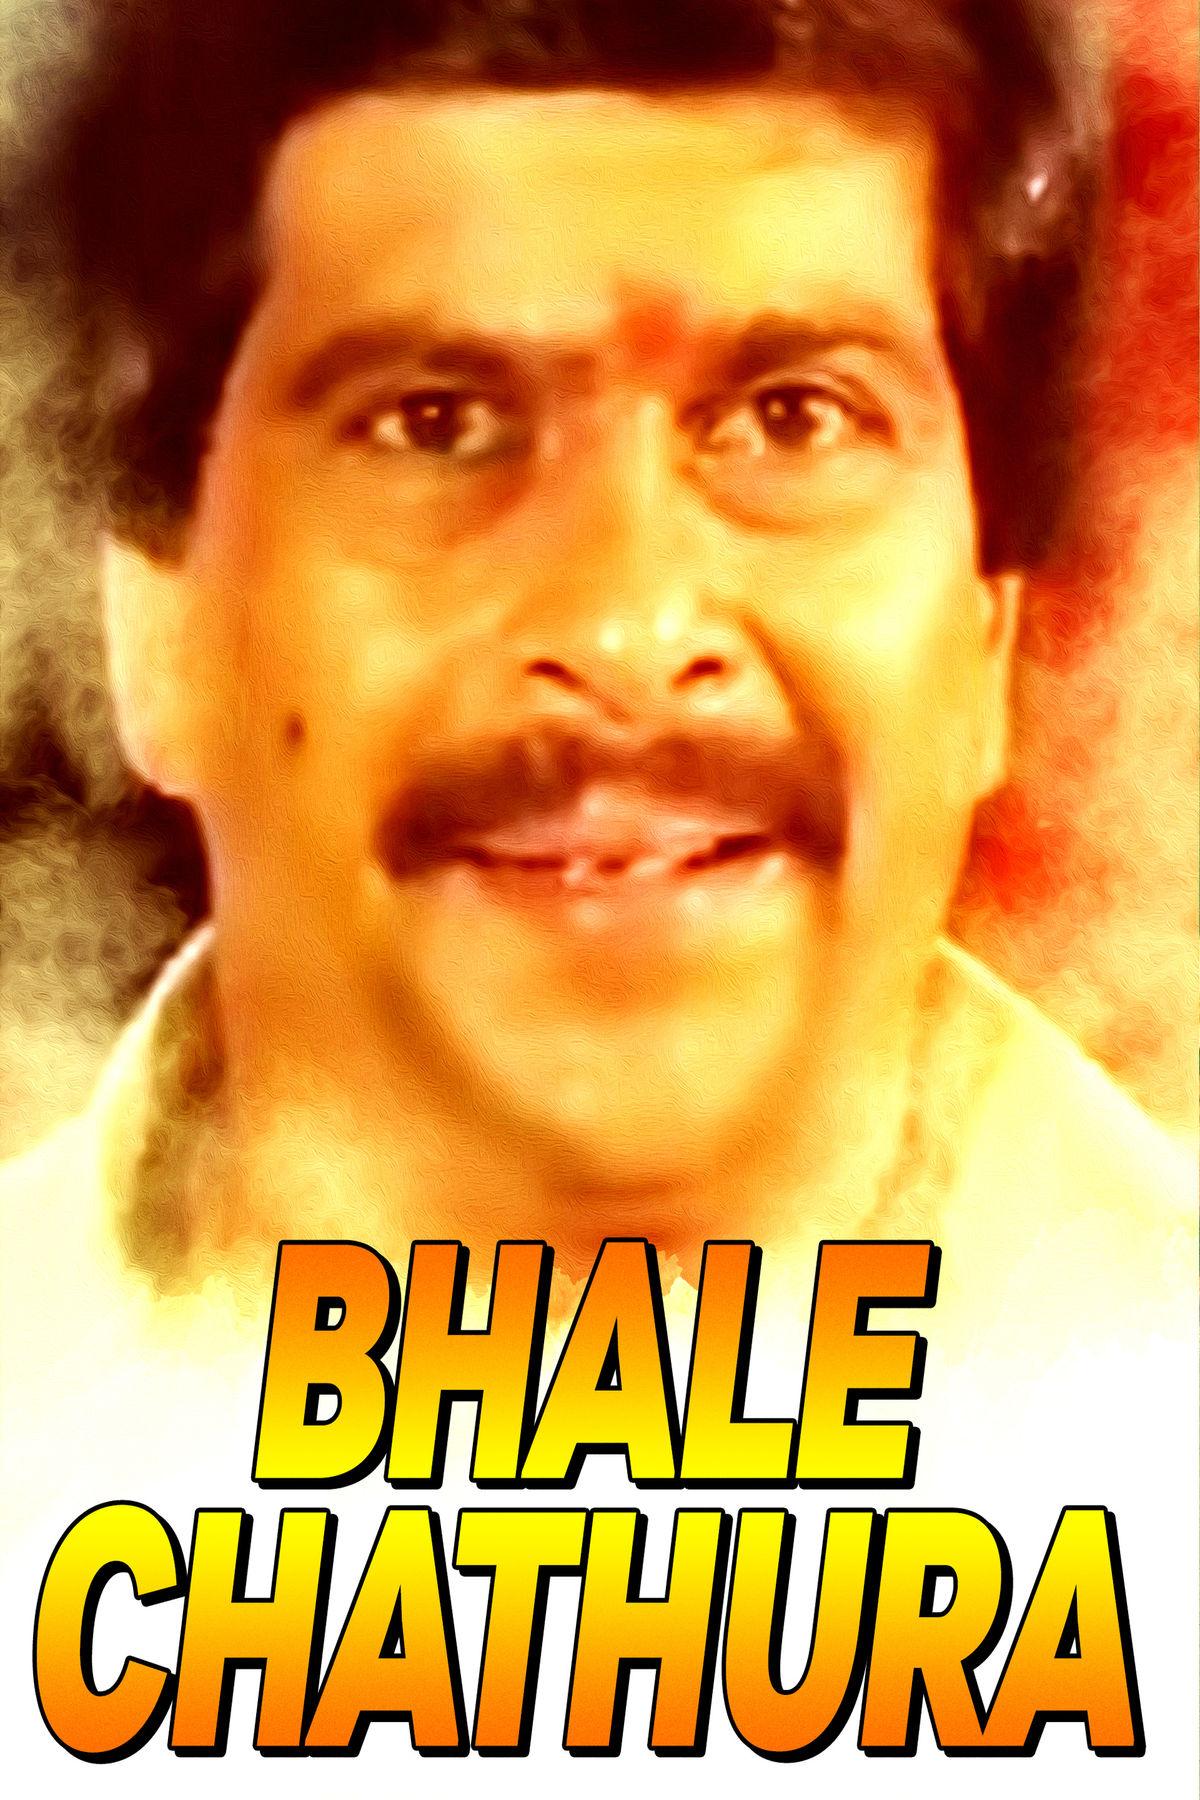 Bhale Chathura